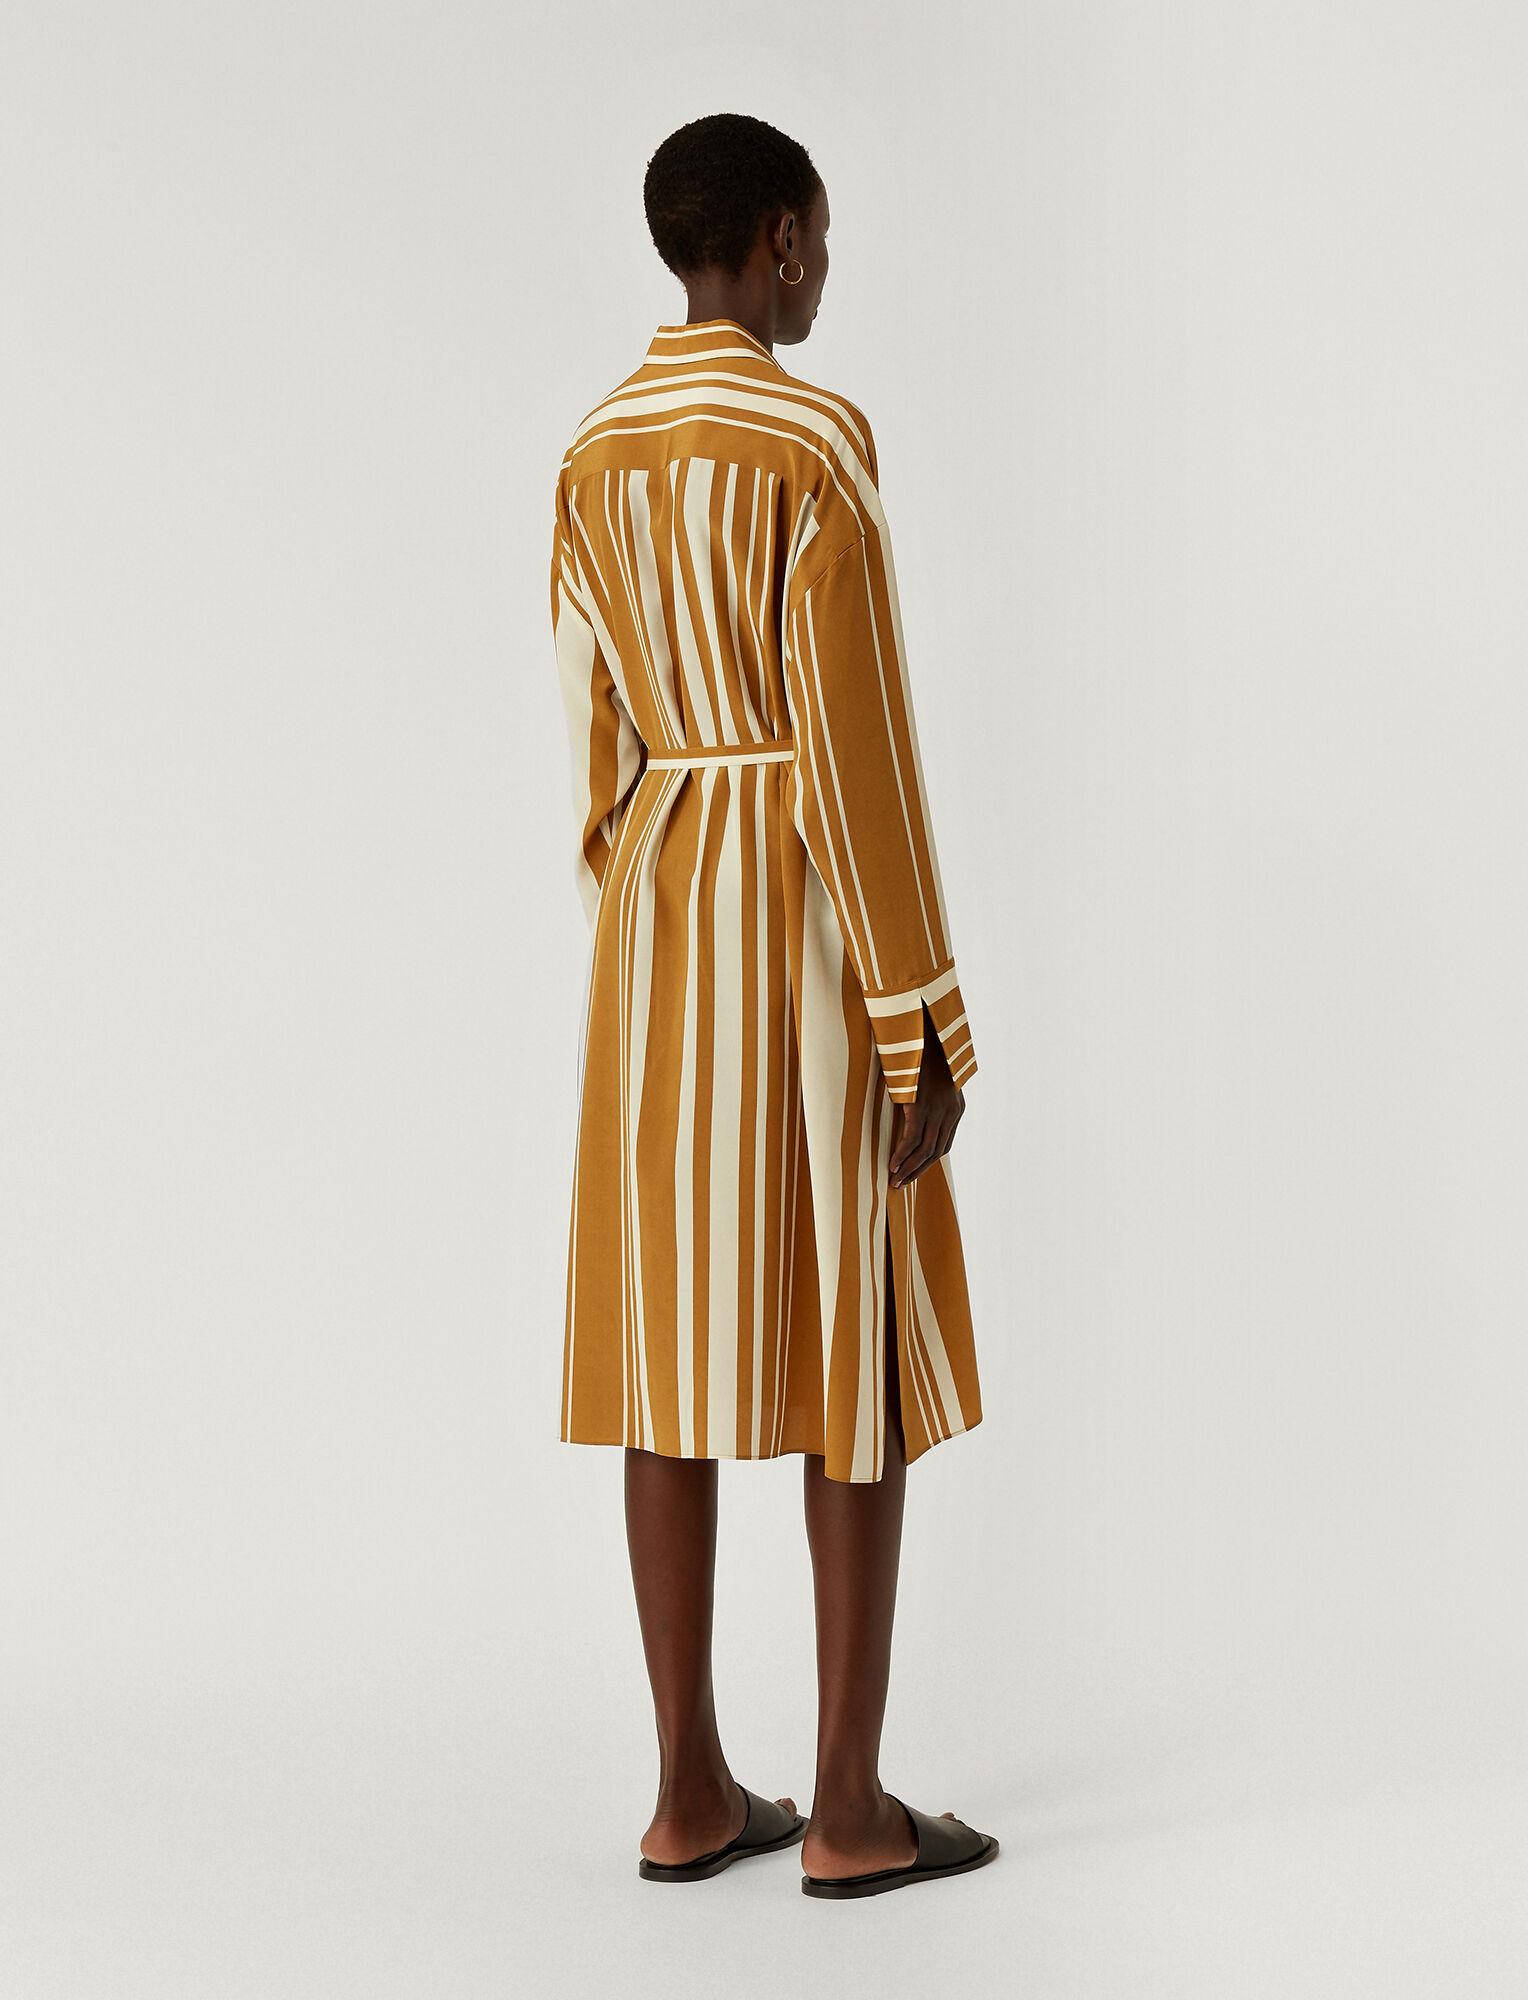 Joseph, Silk Stripes Duras Dress, in GREY/OCRE